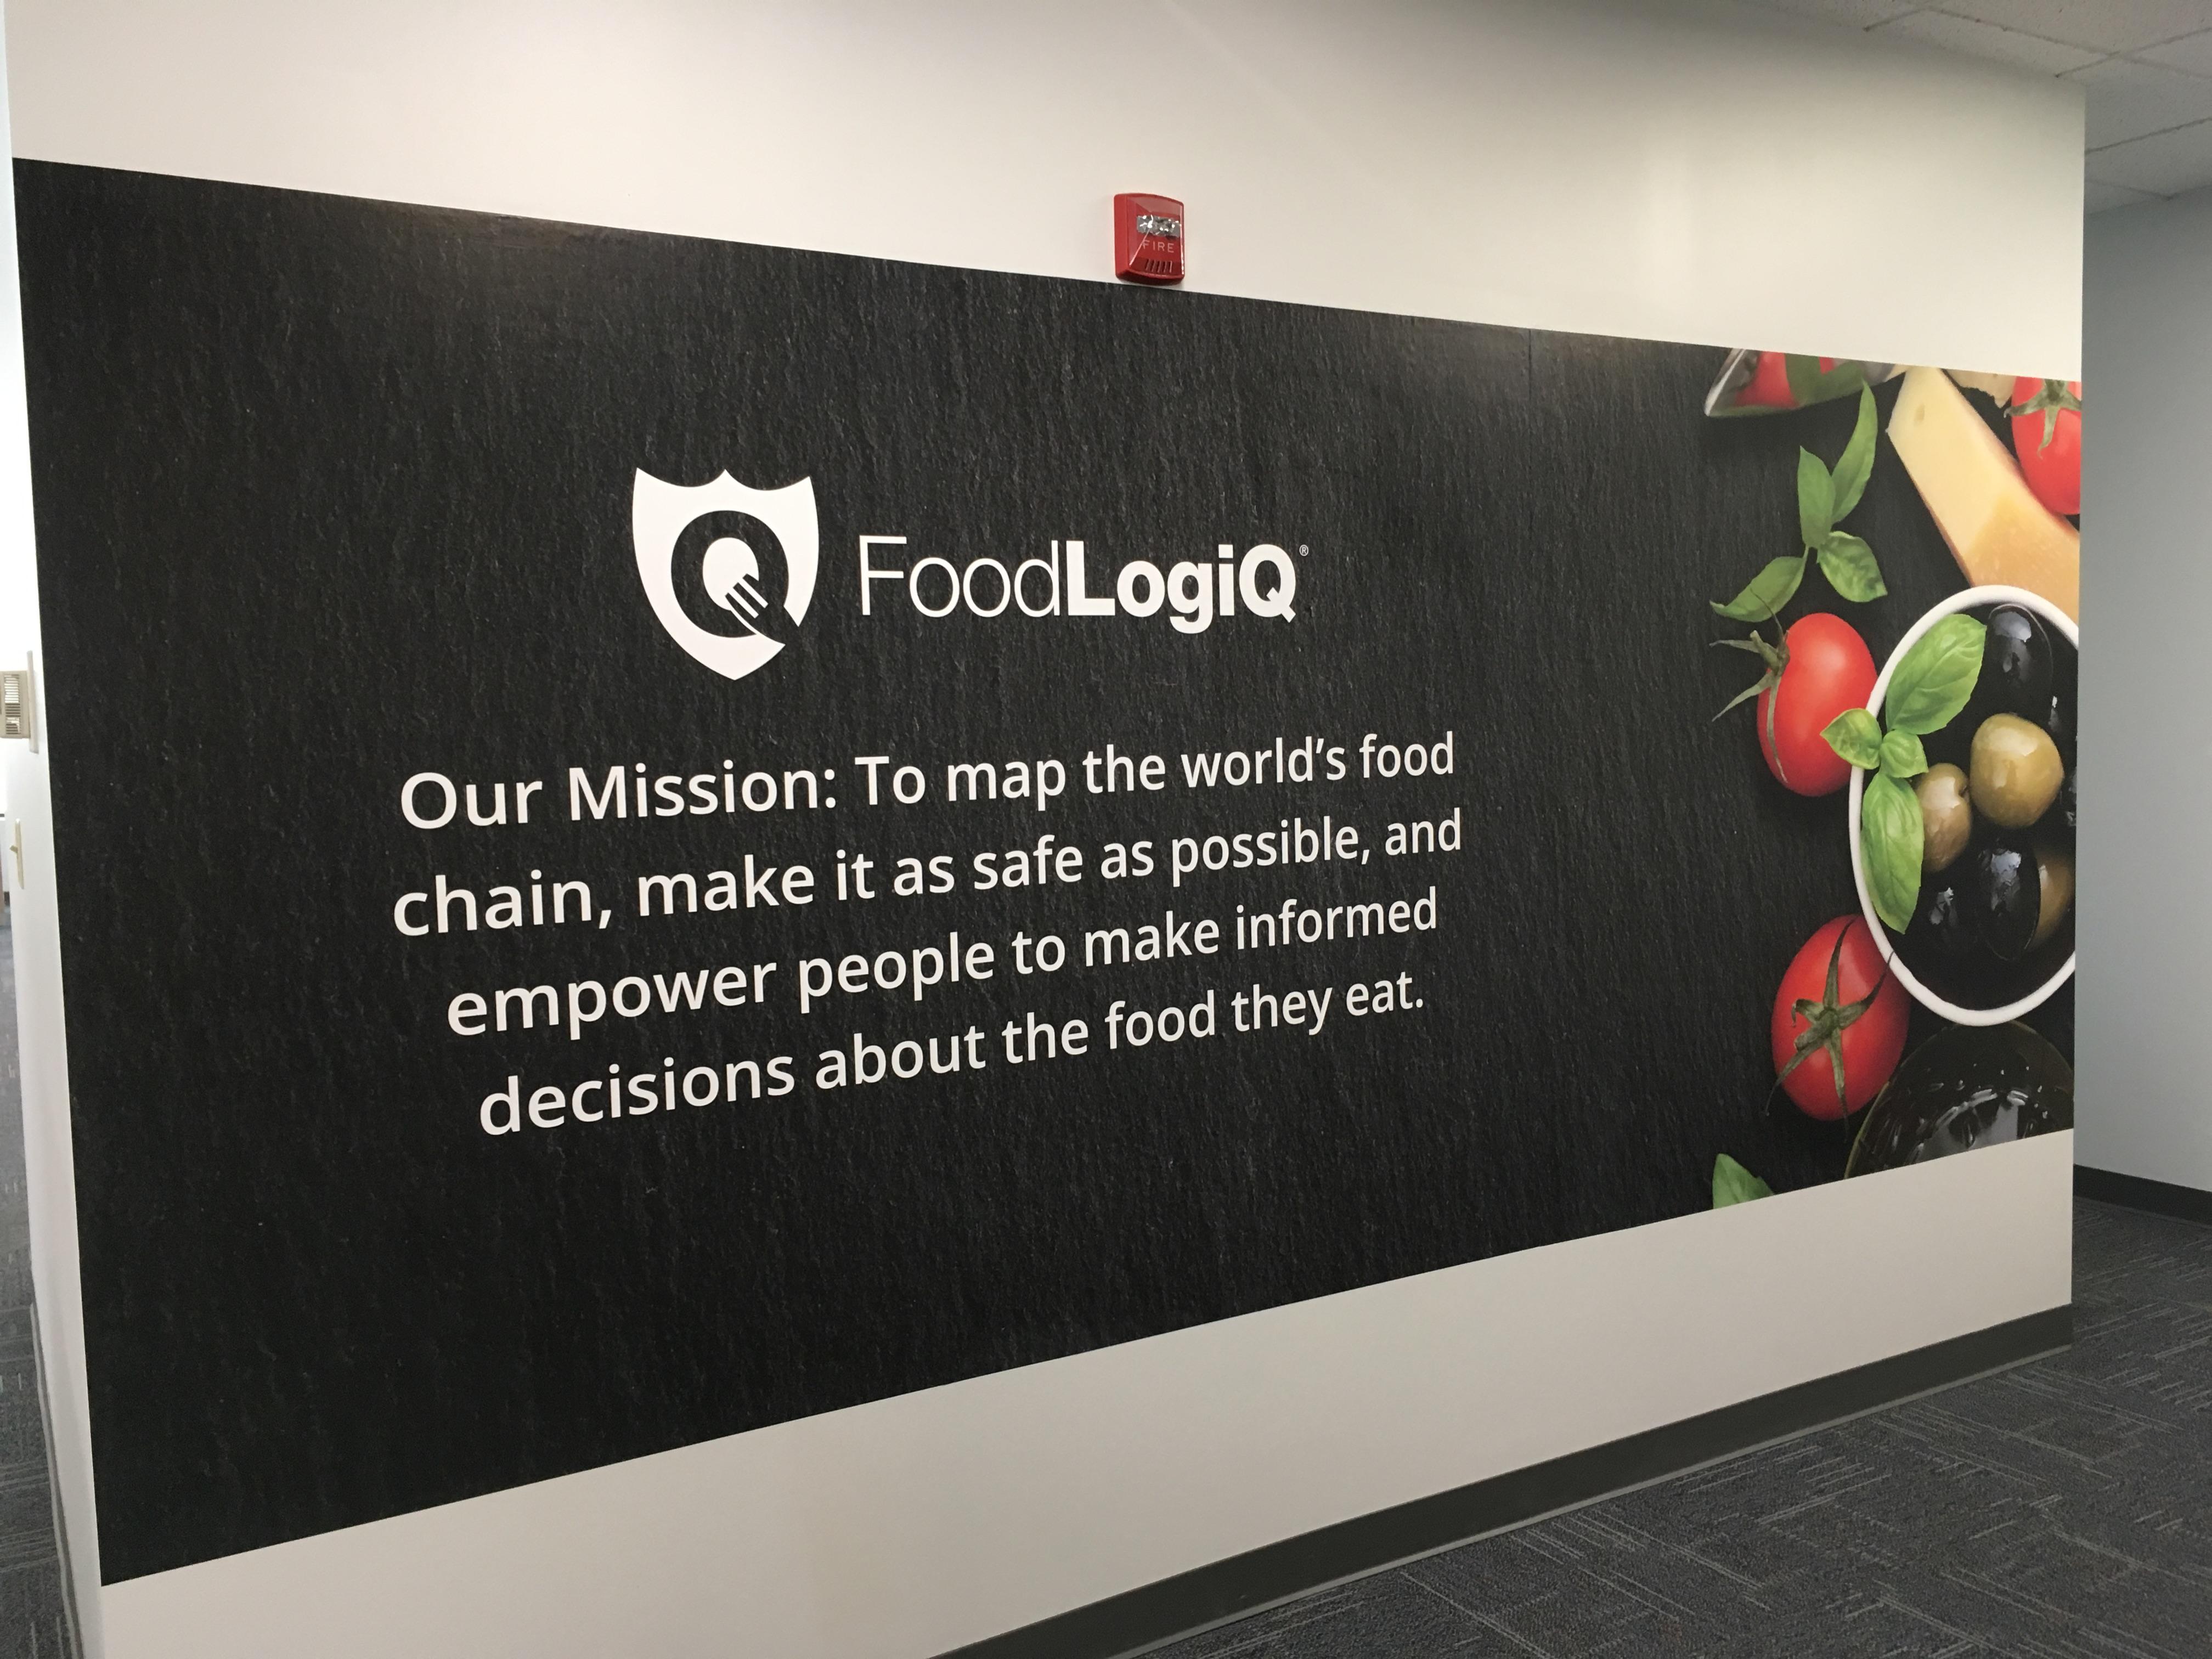 FoodLogiQ's Top 5 Blog Posts of 2017